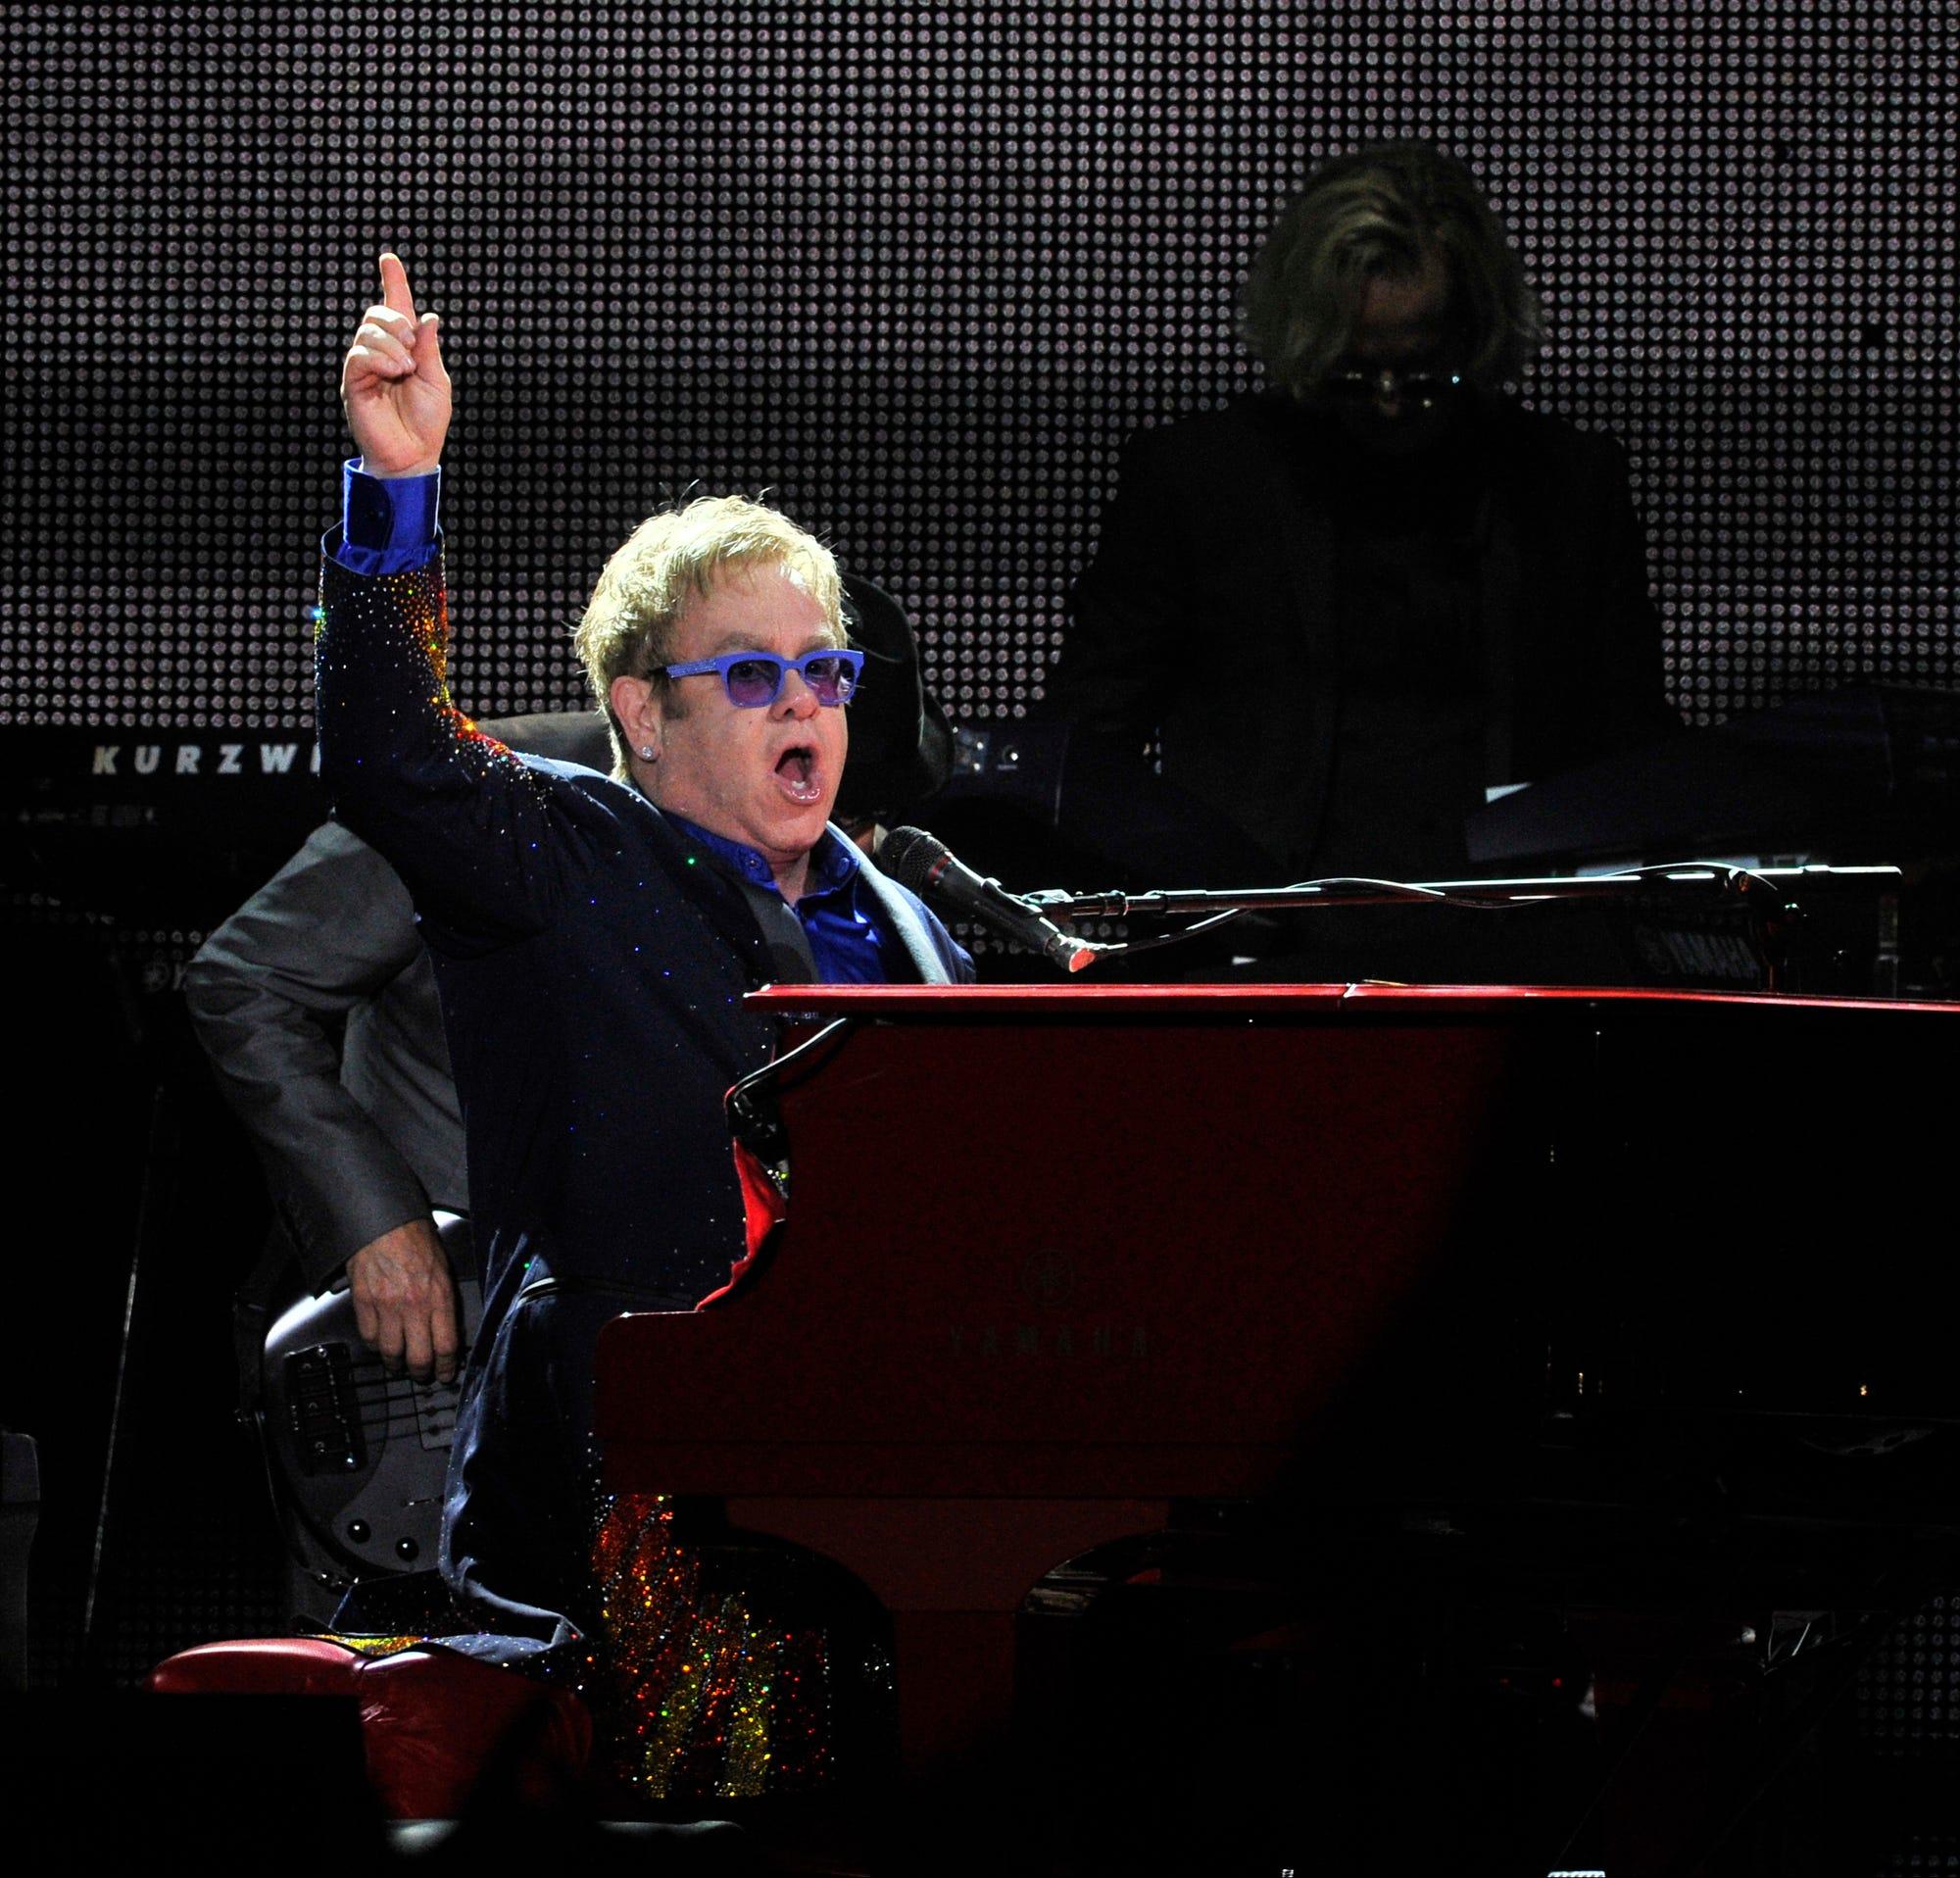 Elton John Farewell Yellow Brick Road tour coming to MetLife Stadium in 2022. See dates